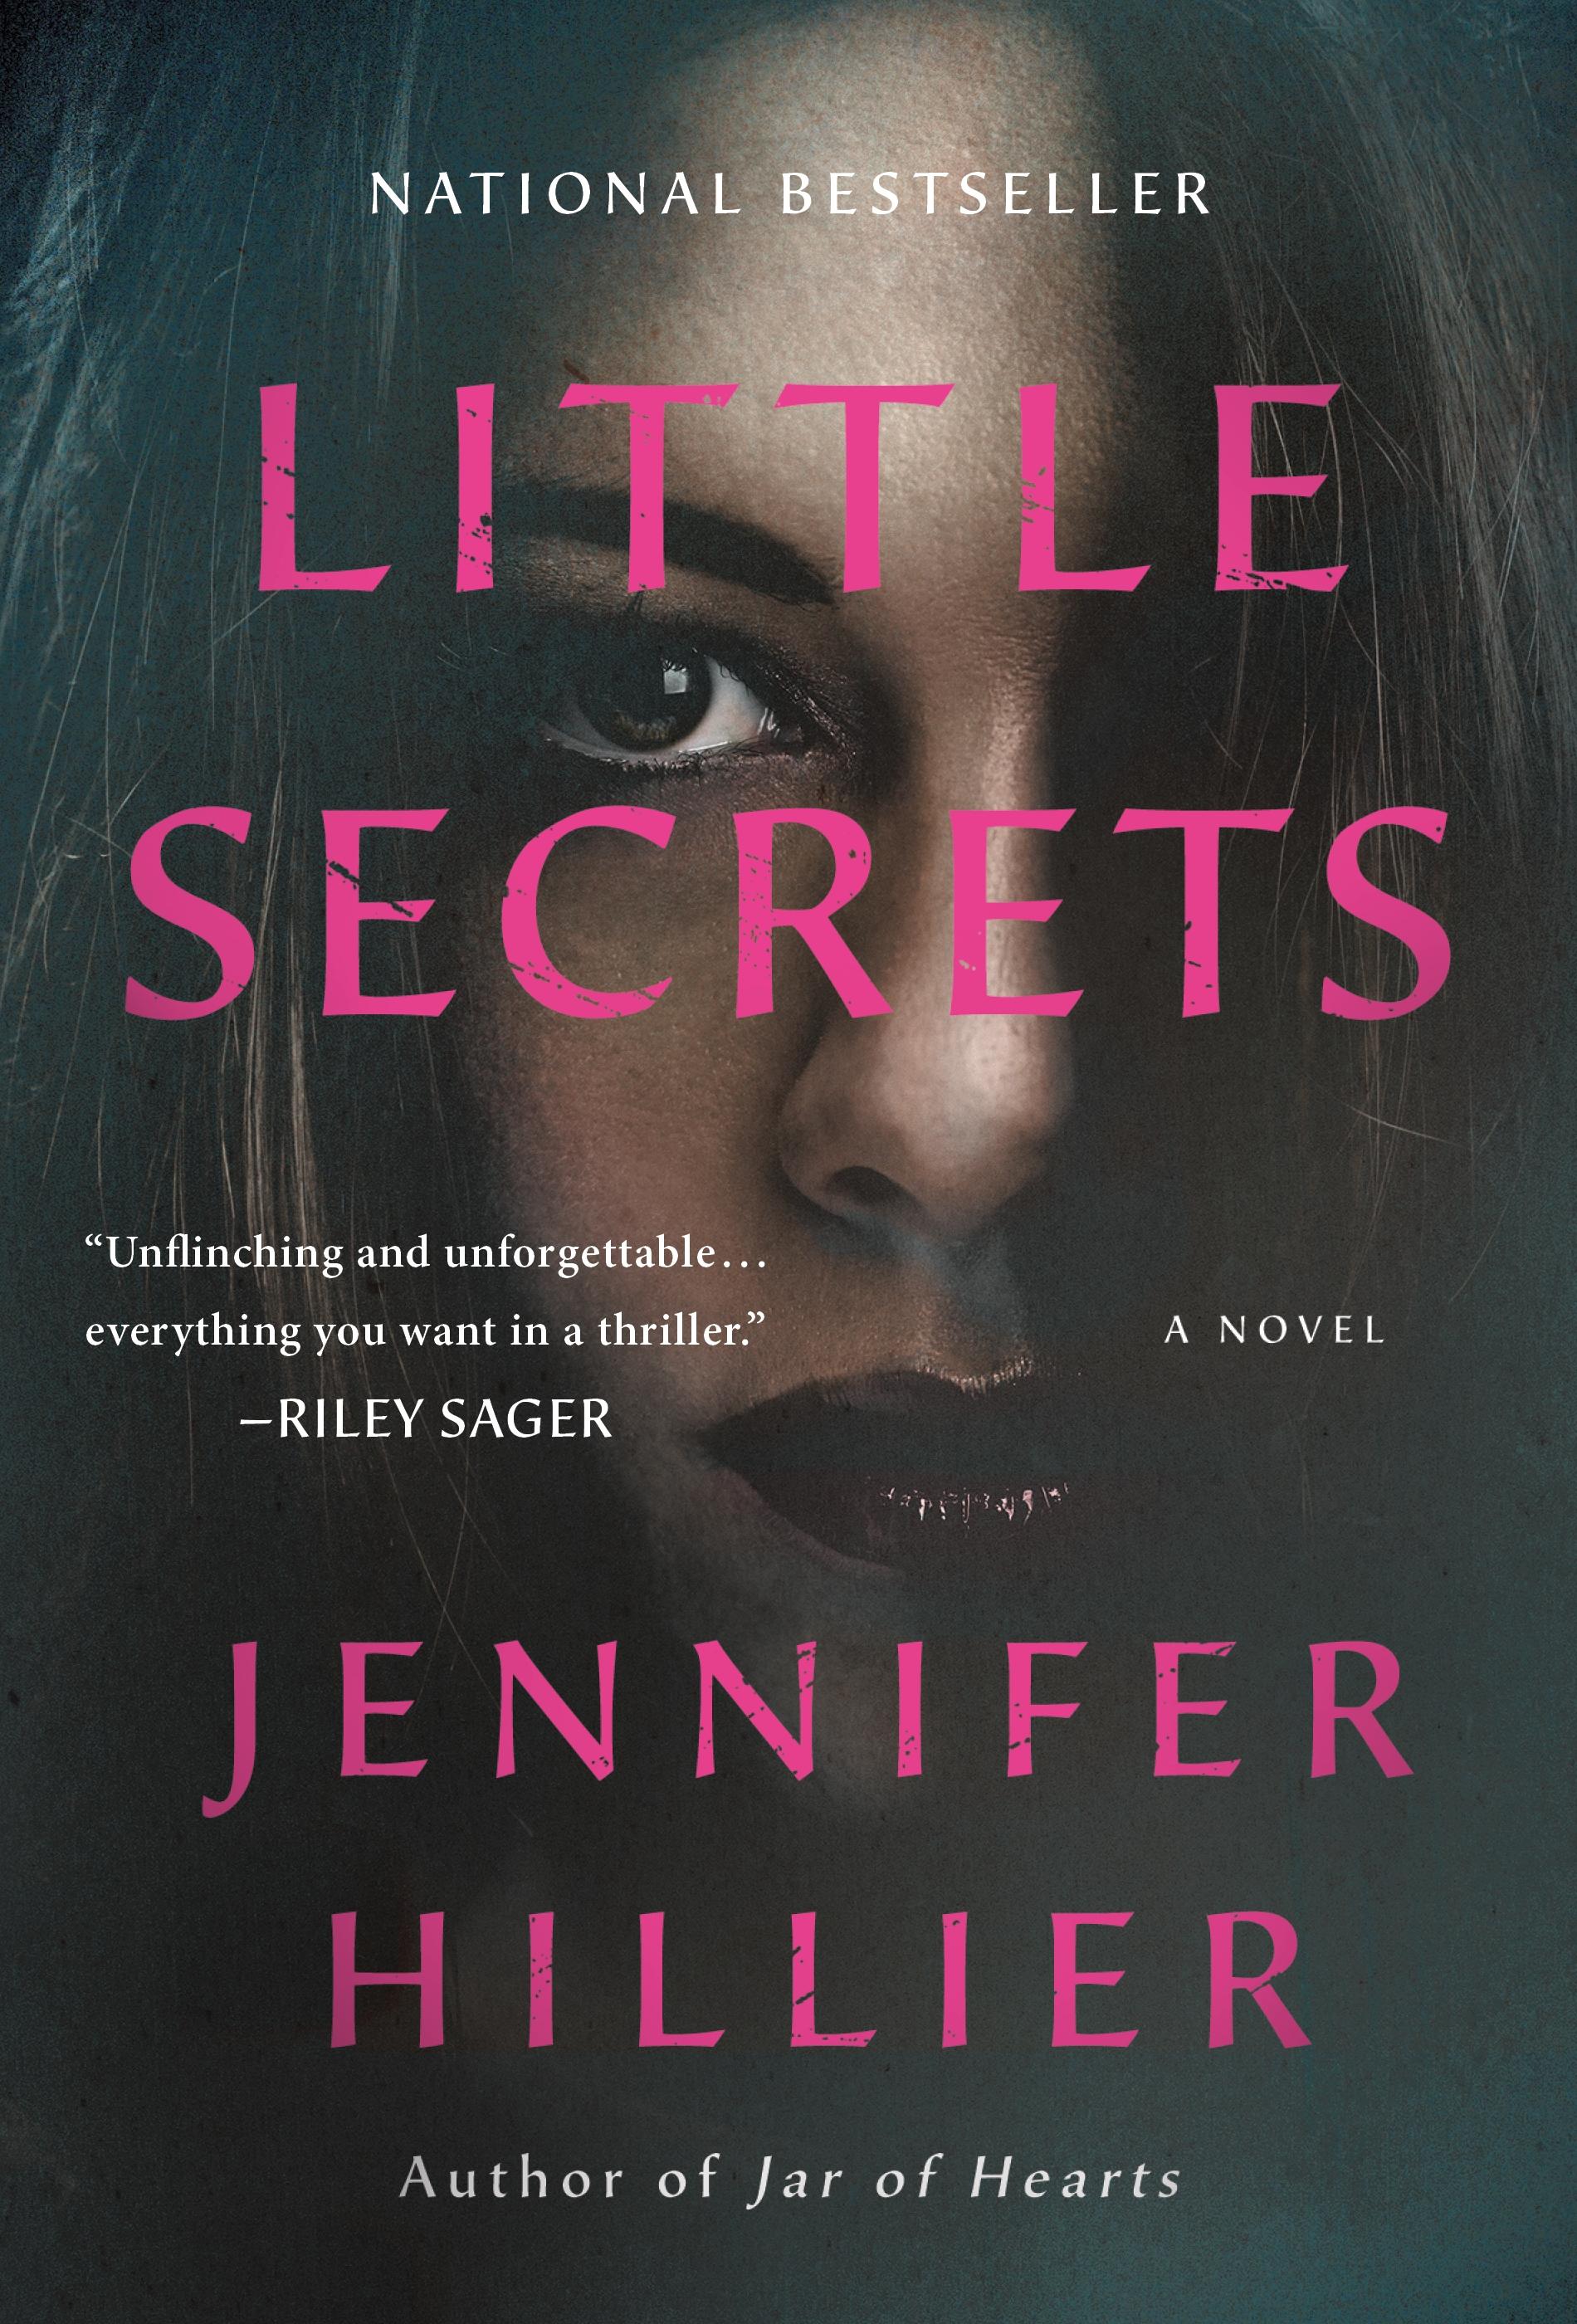 Little Secrets [electronic resource] : A Novel